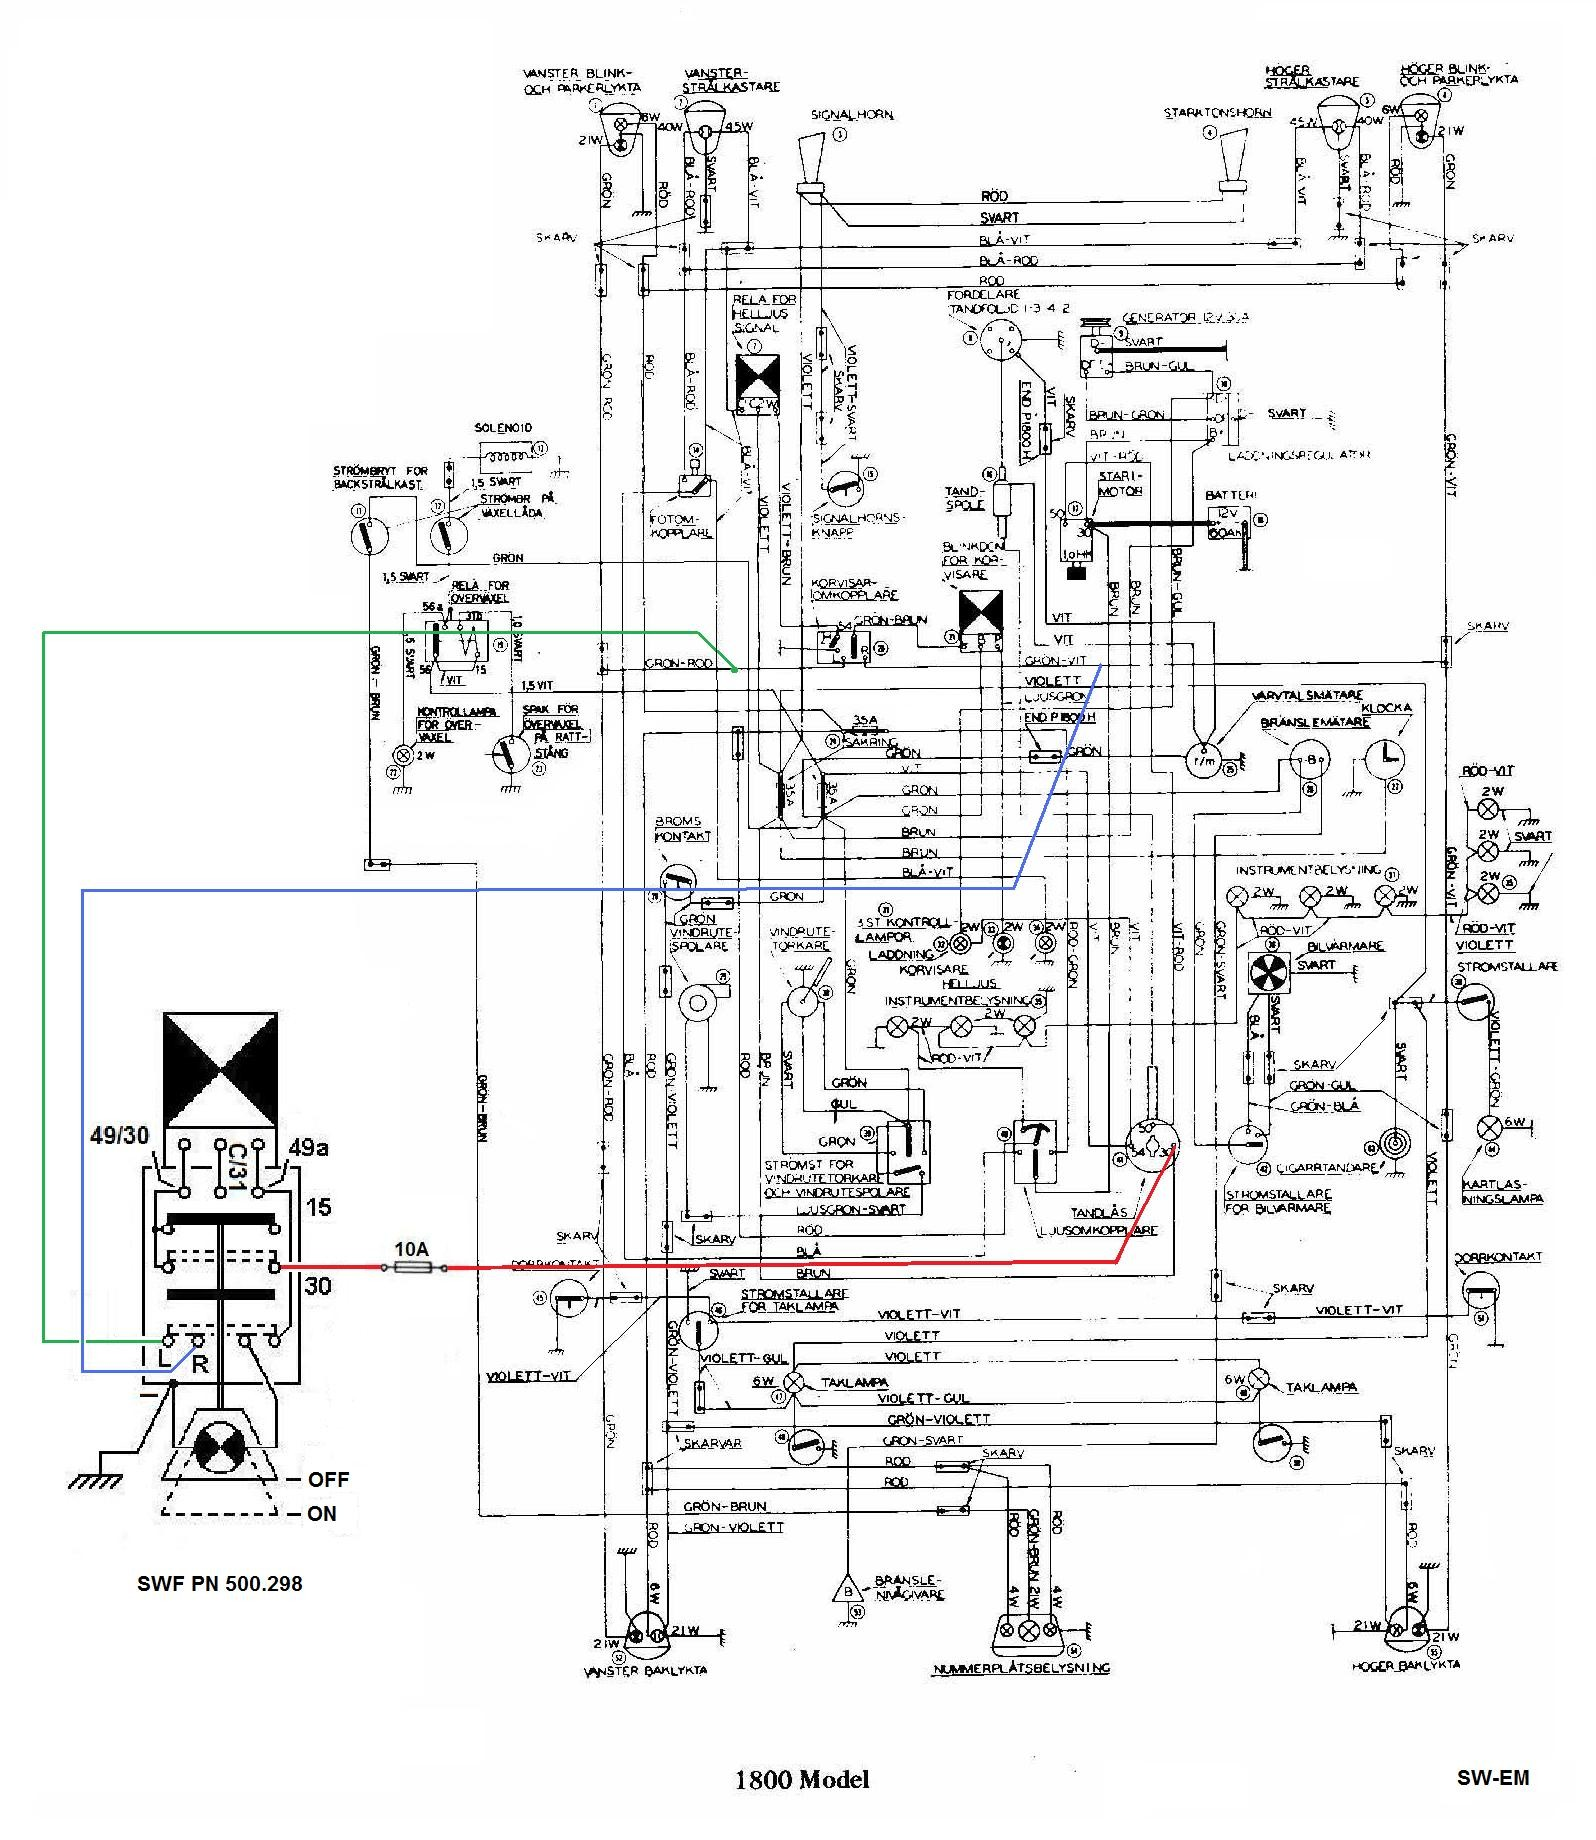 3 Prong Flasher Wiring Diagram Sw Em Emergency Flasher Of 3 Prong Flasher Wiring Diagram